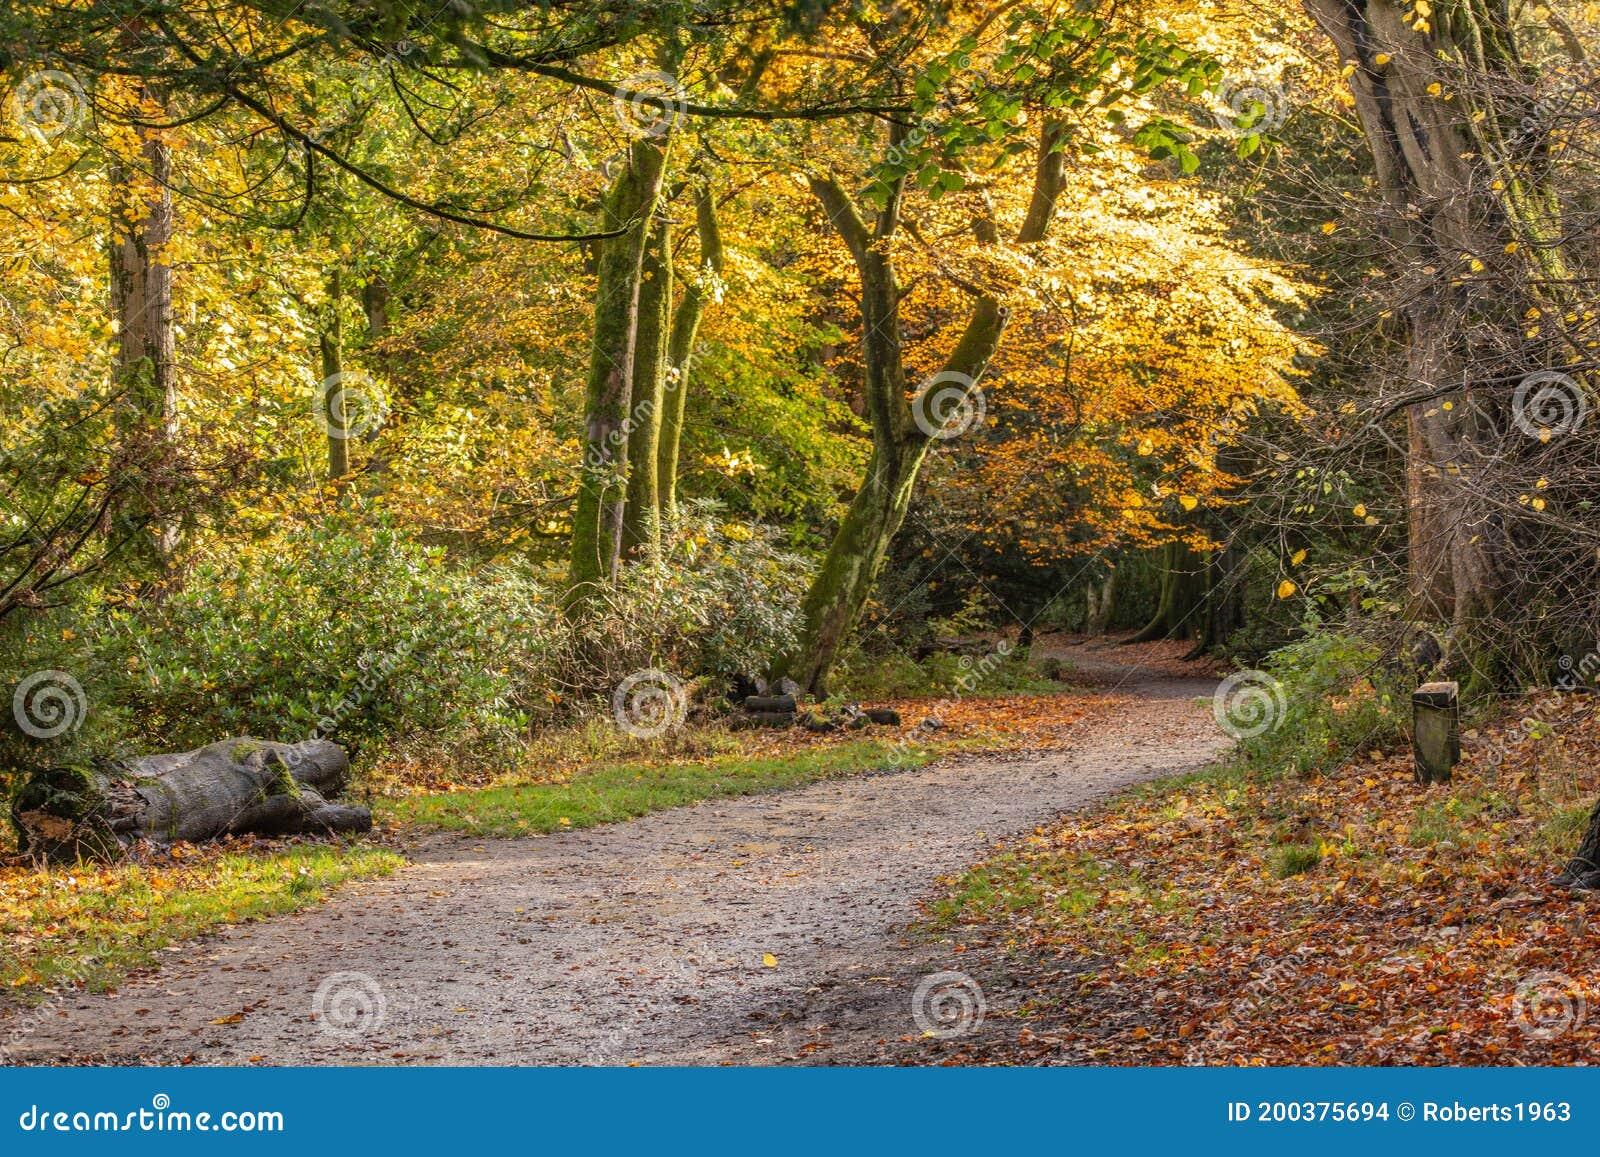 Pathway Through The Autumn Forest Stock Photo Image Of Foliage Tree 200375694